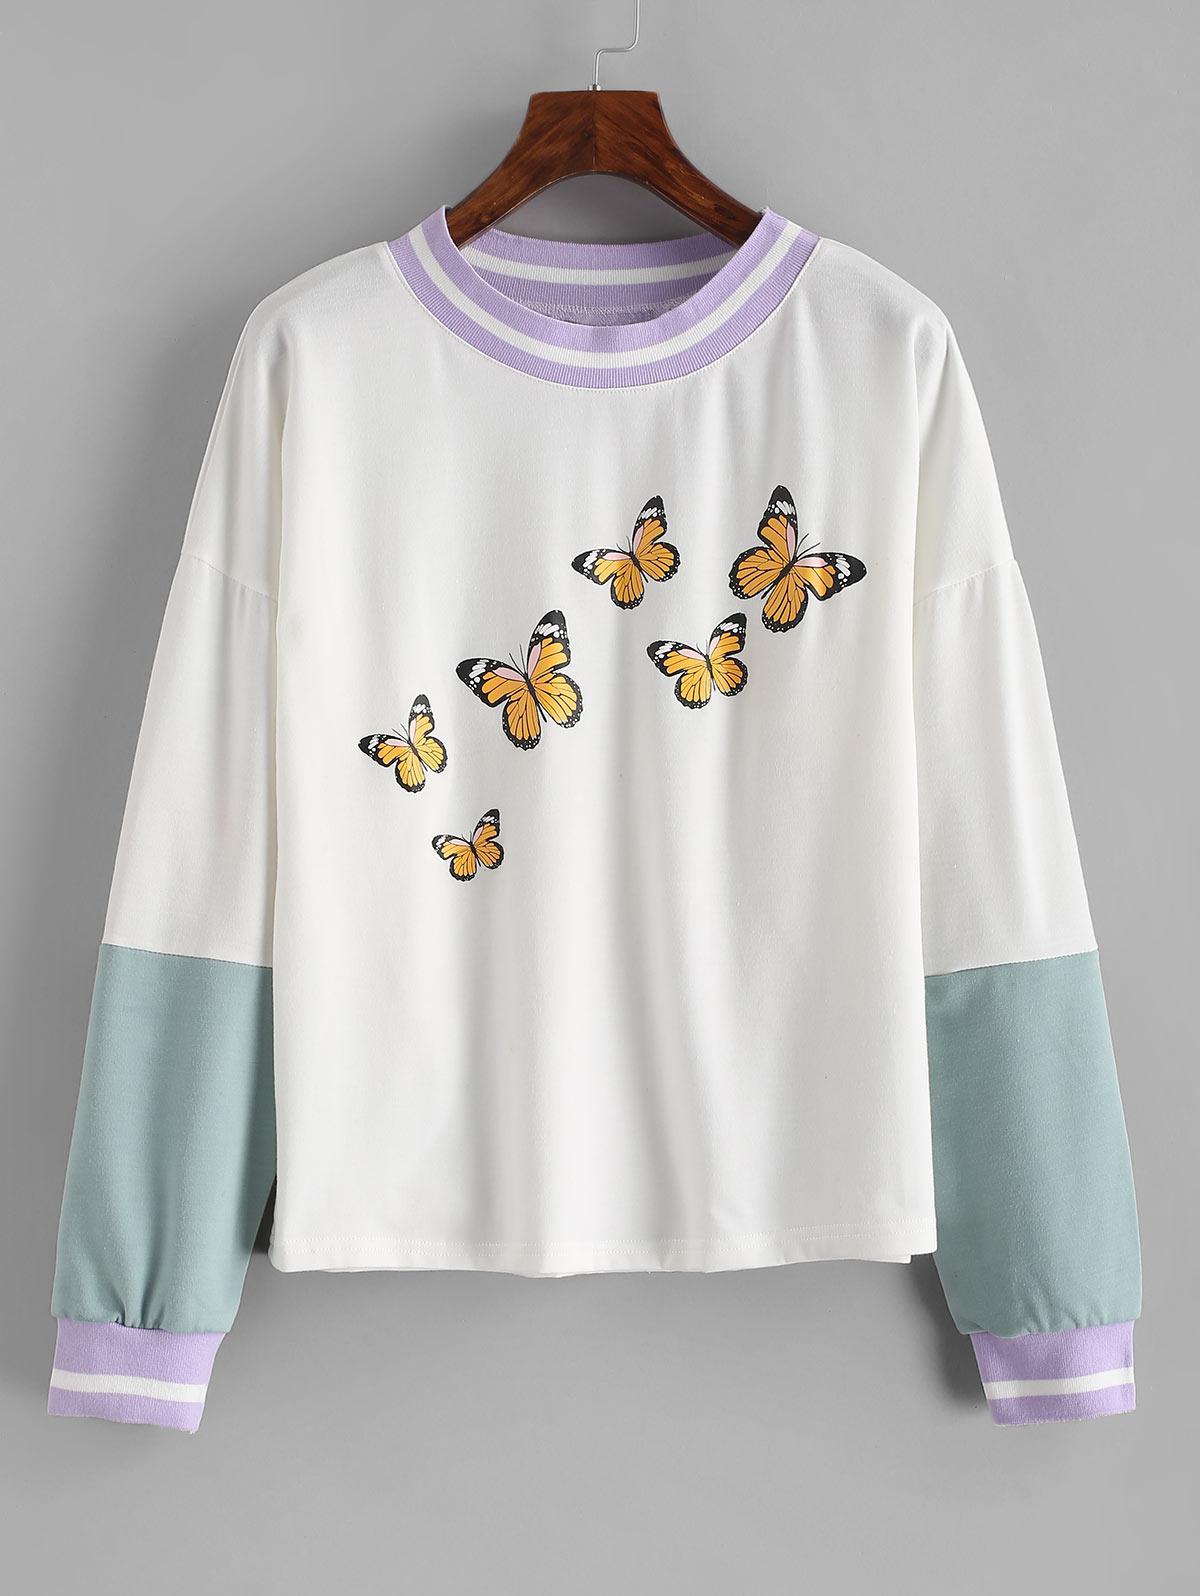 Drop Shoulder Butterfly Print Colorblock Sweatshirt